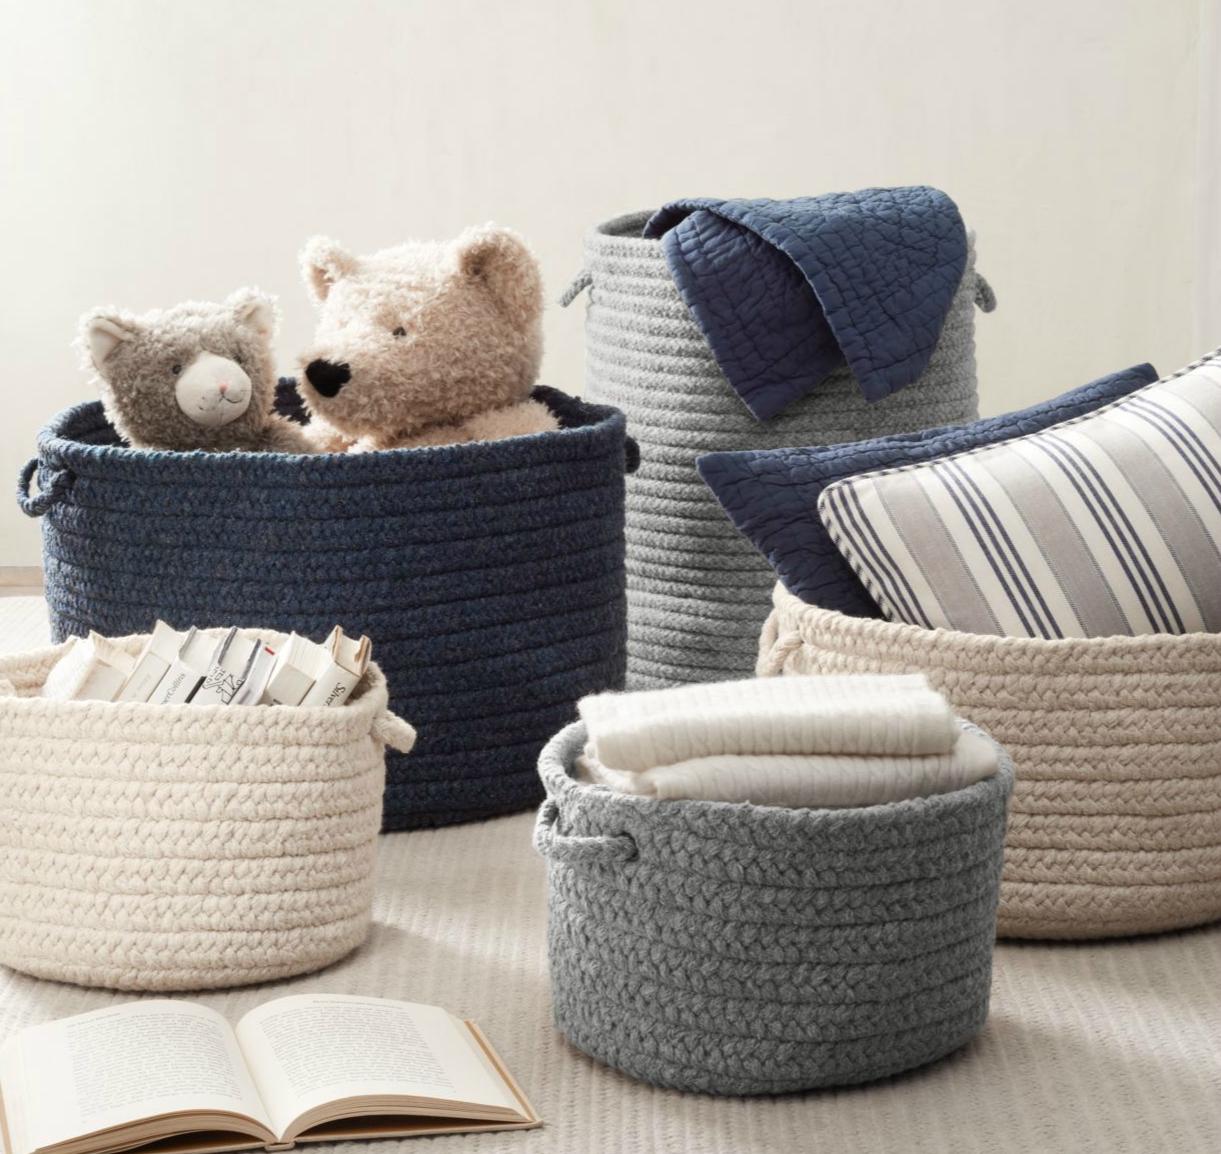 Braided baskets from RH Baby & Child